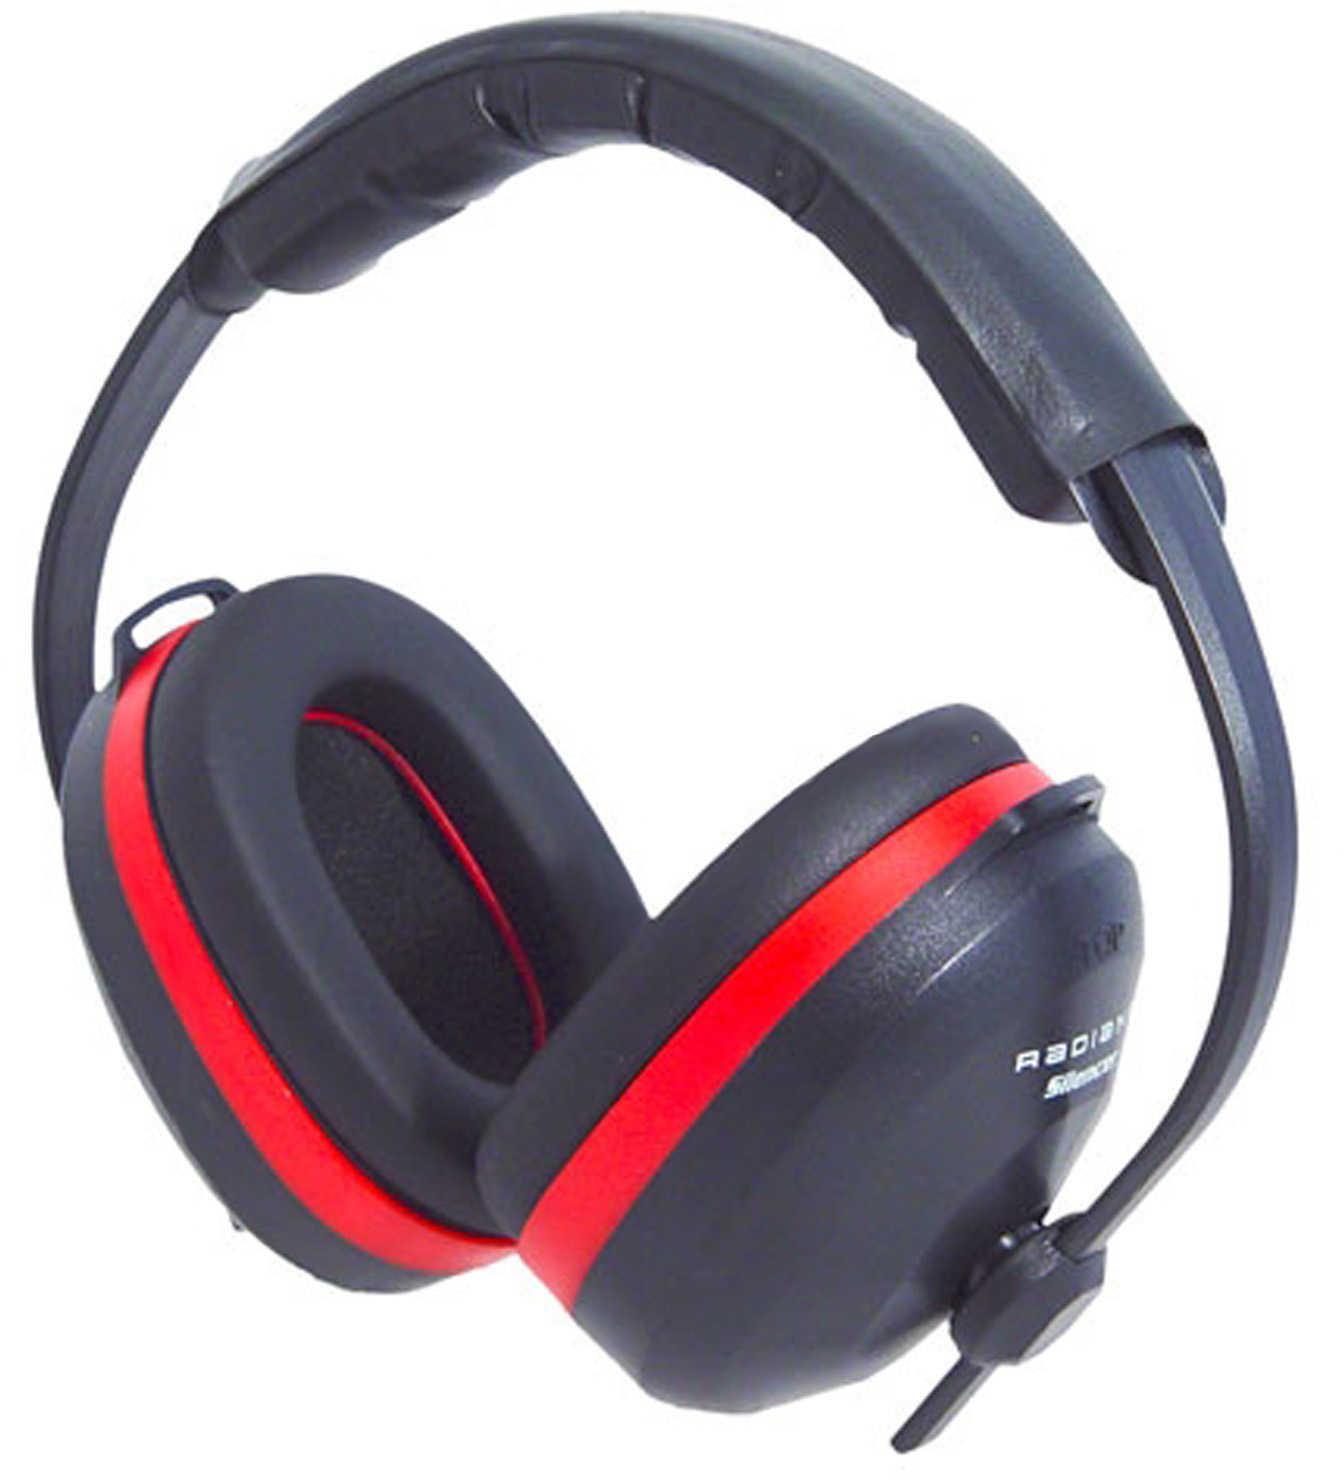 Radians Lightweight Durable Earmuffs With Foam Ear Cushions Md: SL0130Cs